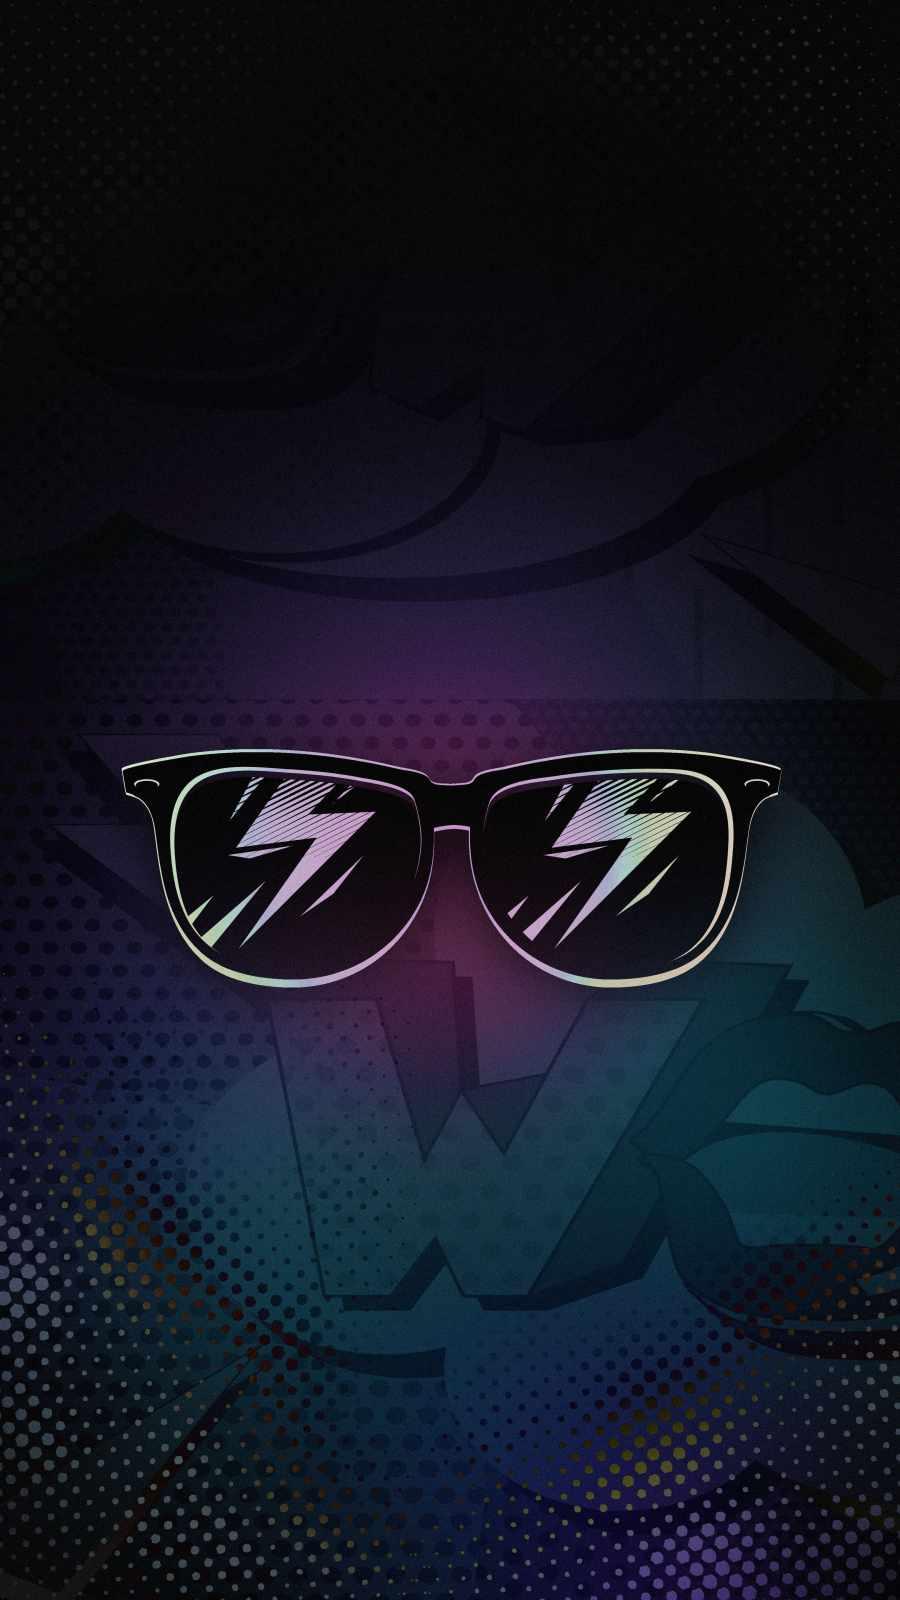 Retro Glasses iPhone Wallpaper